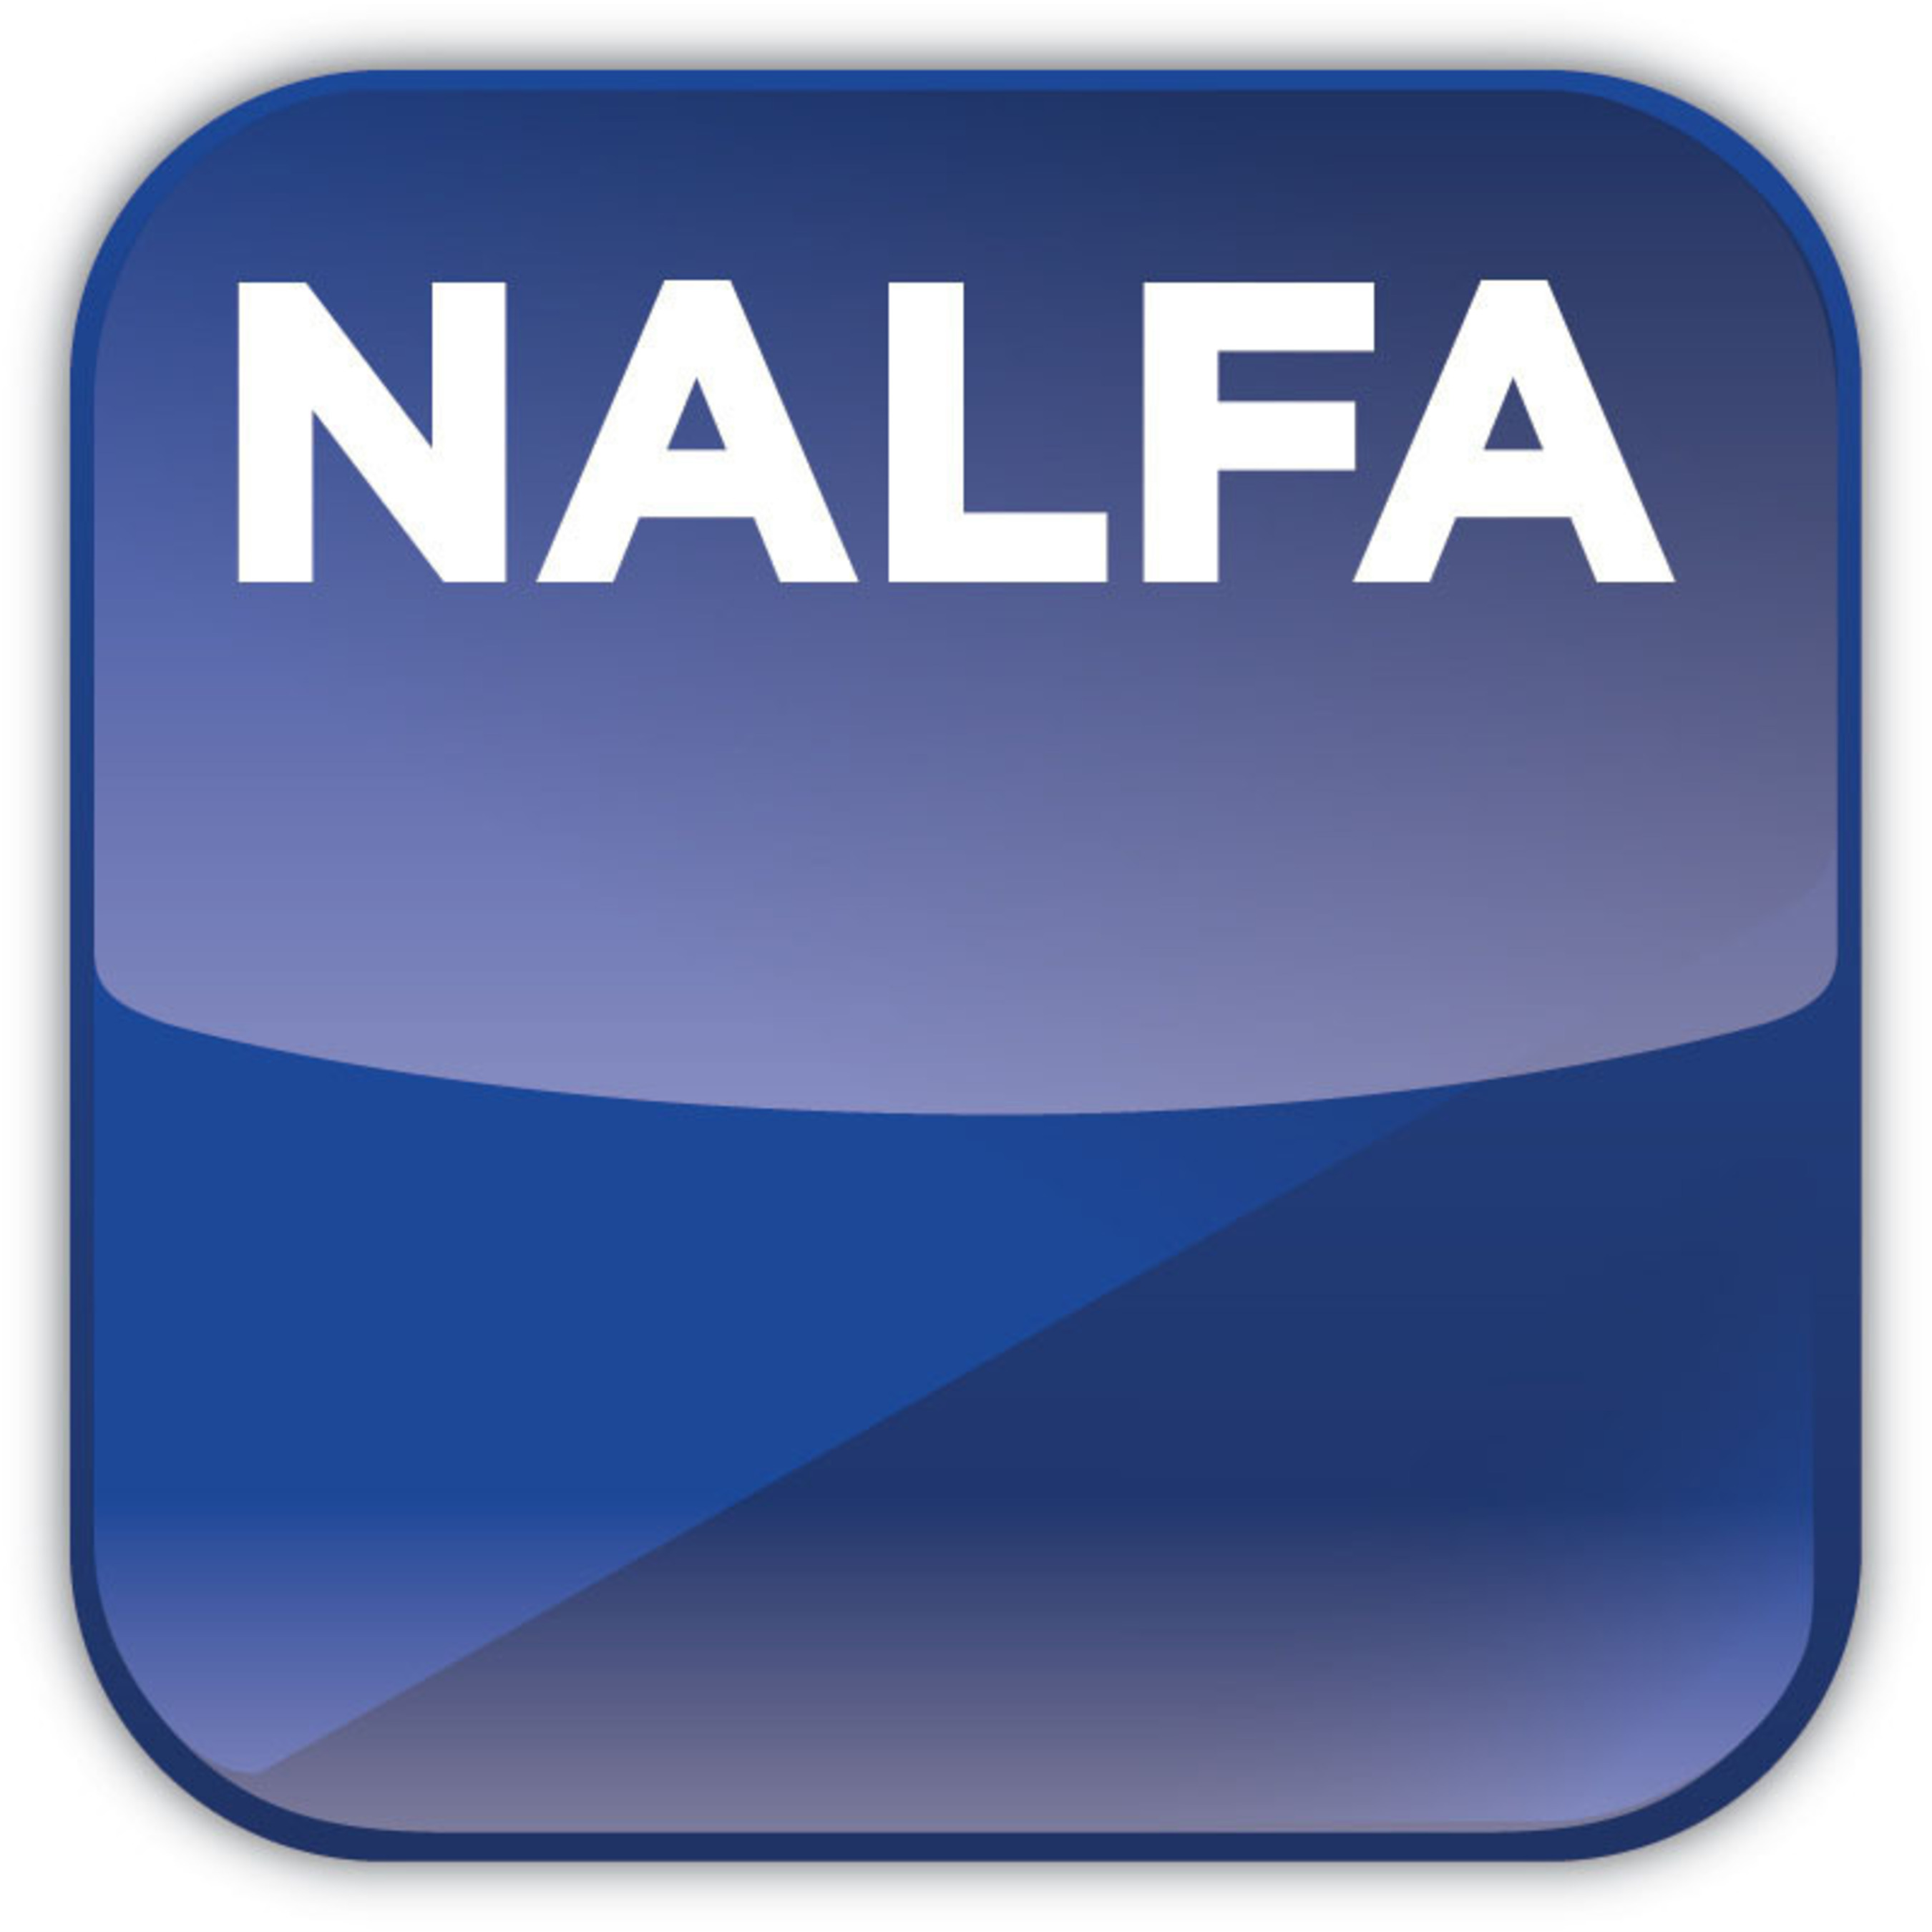 NALFA Logo.